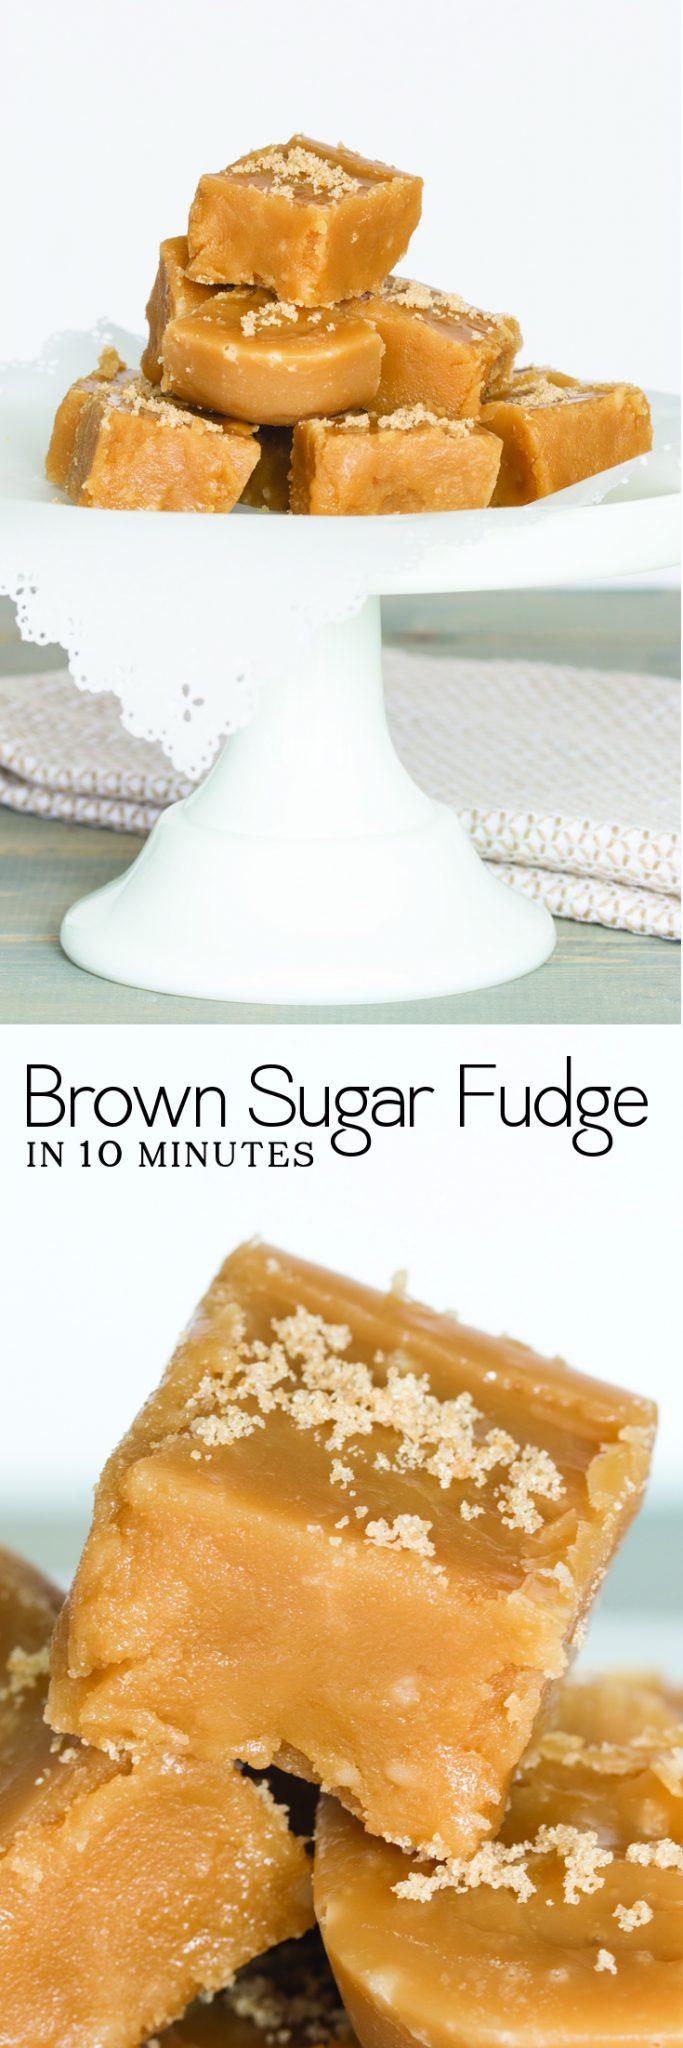 brown sugar fudge image collage